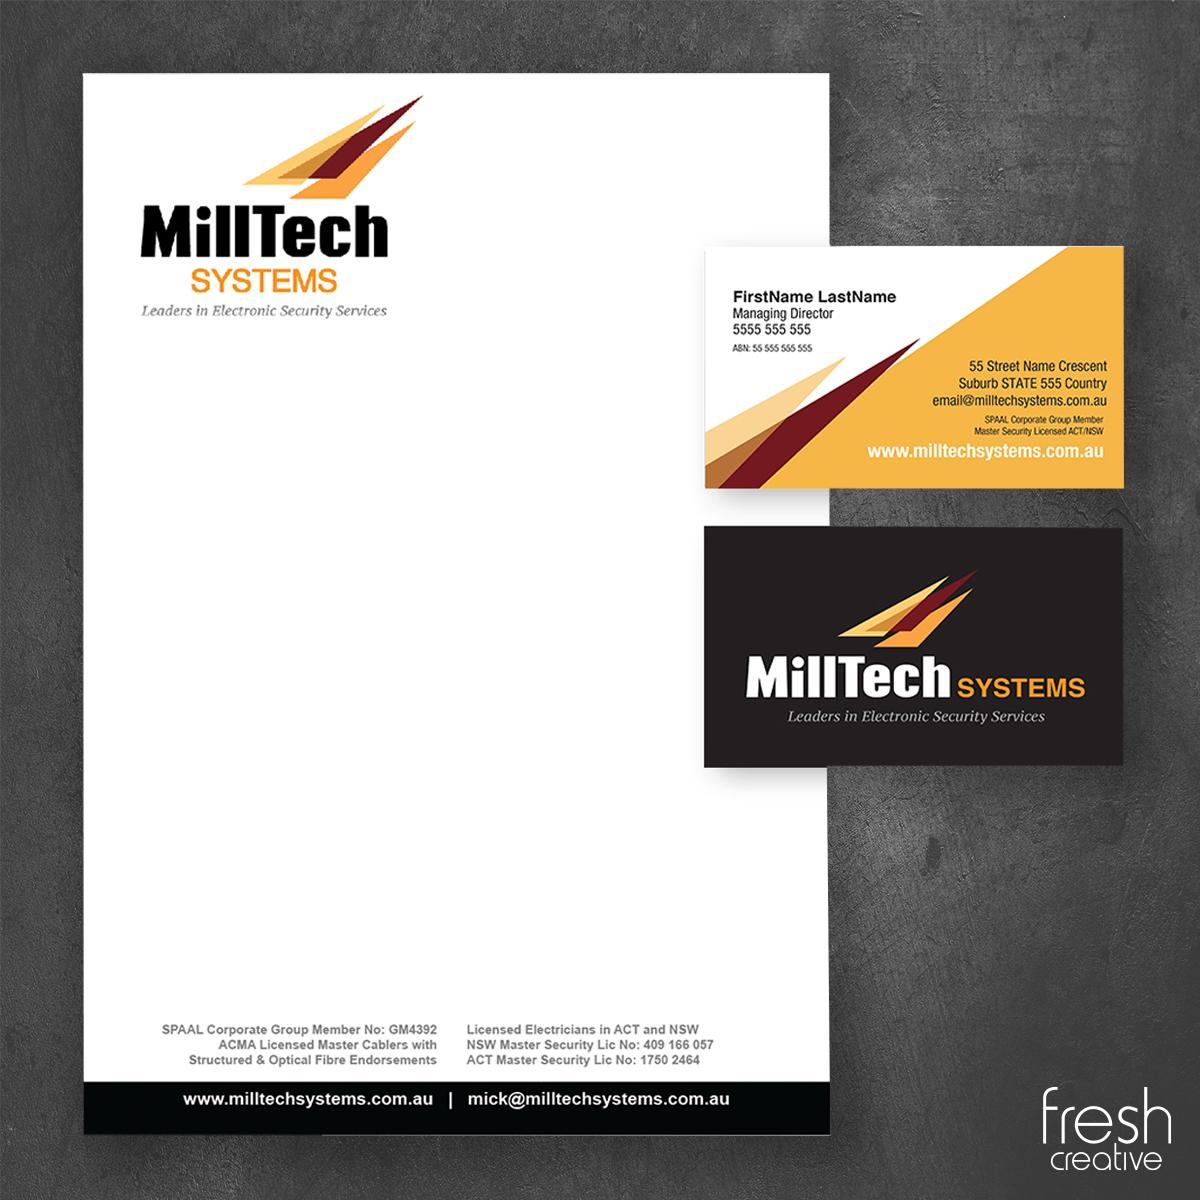 MillTech Custom Stationery Canberra